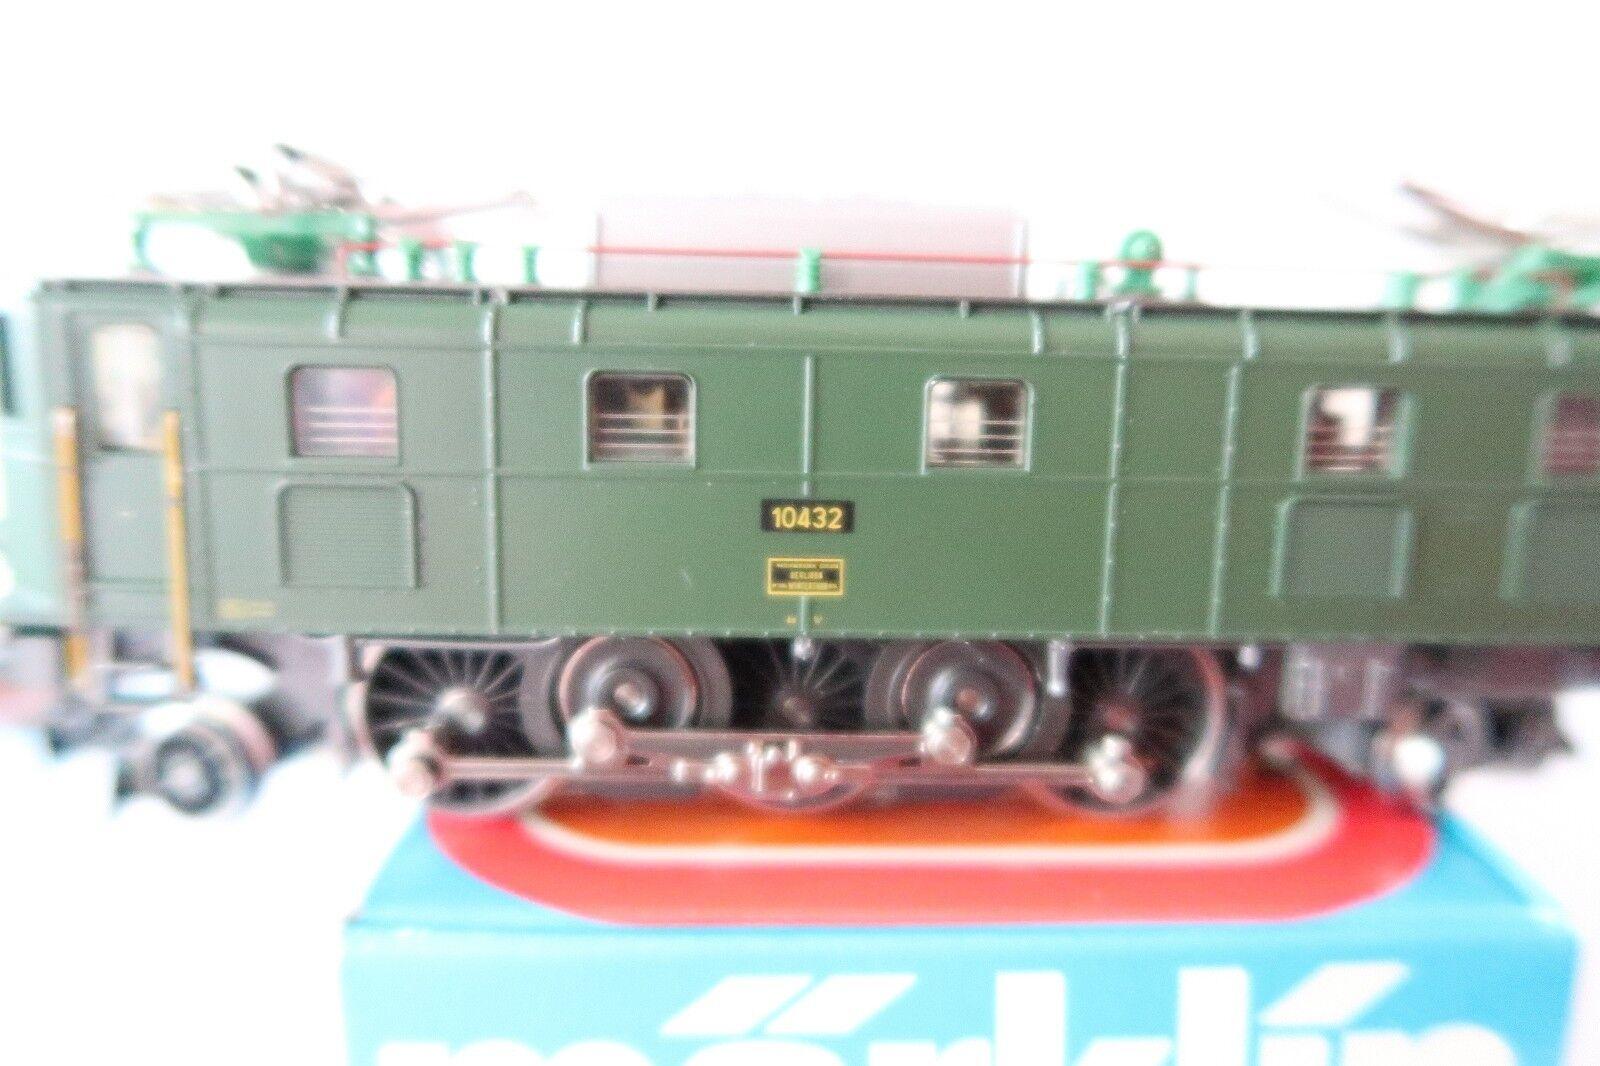 Marklin ho ac 3167 e-Lok AE 3 6 br 10432 SBB (ad 43-35s1 2)